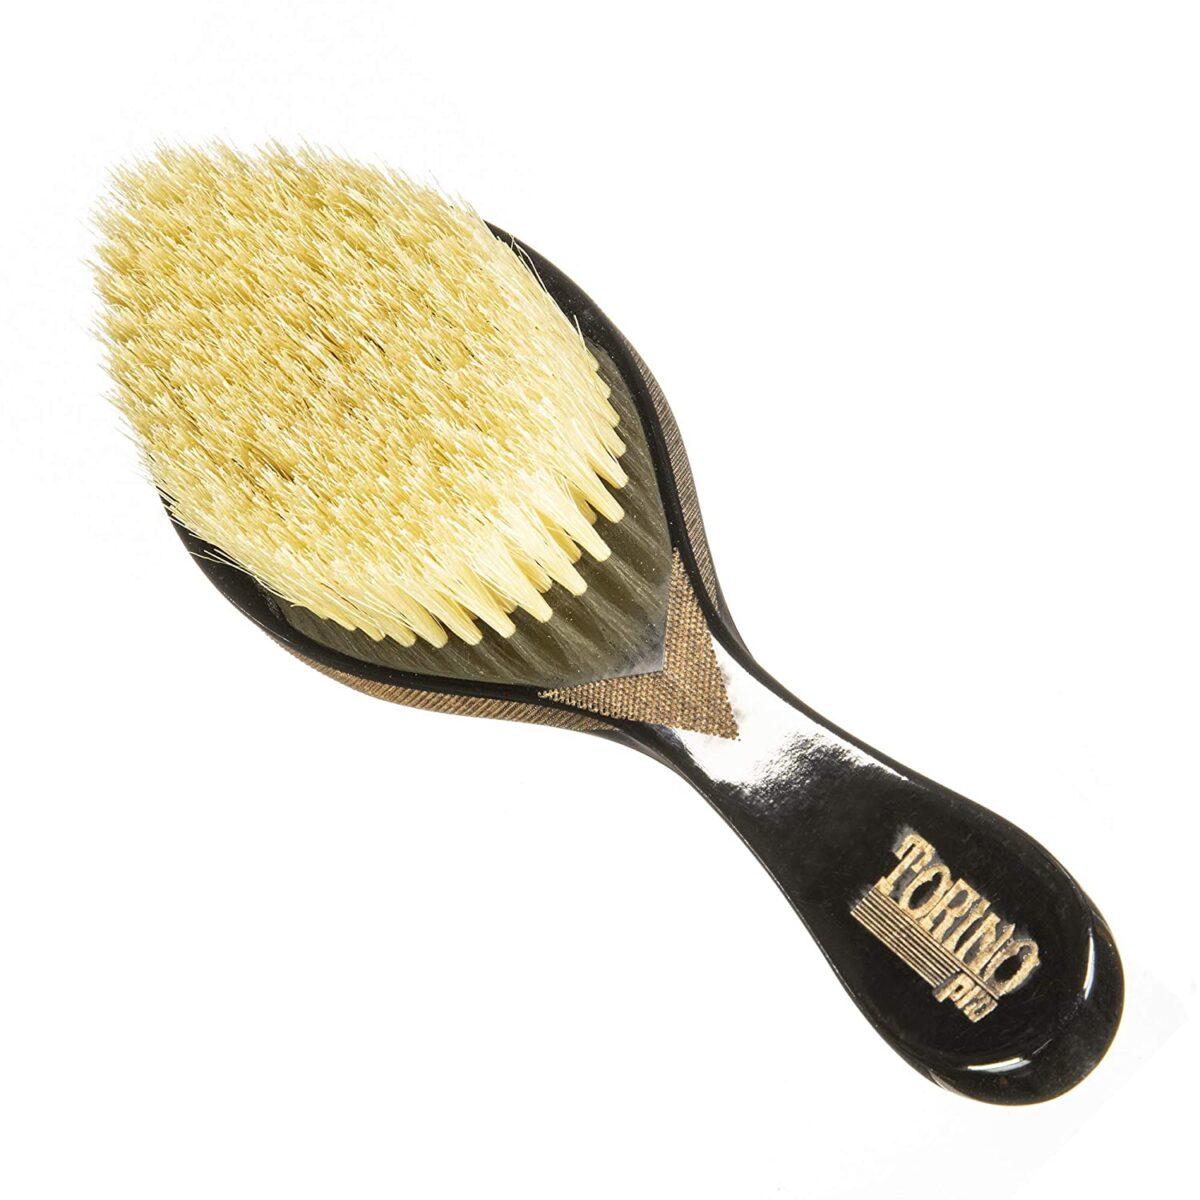 hairbrush fofr waves